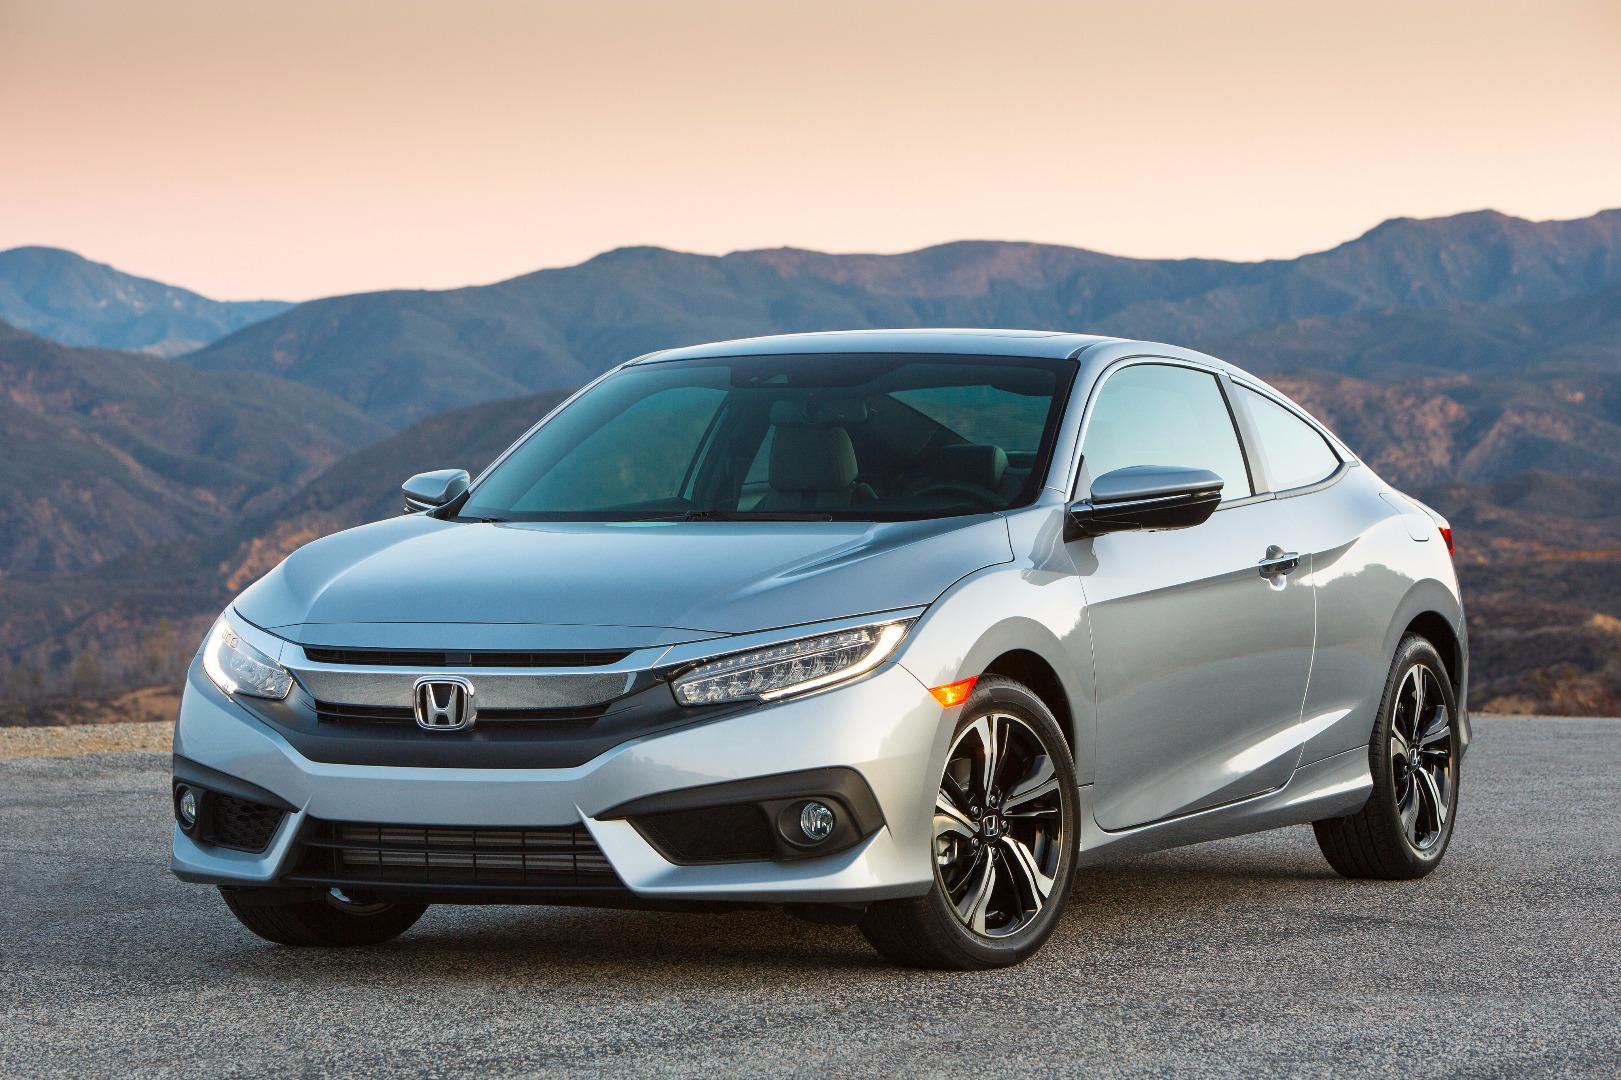 News - Honda Recalls 350,000 Civics In US For Parking Brake Fault